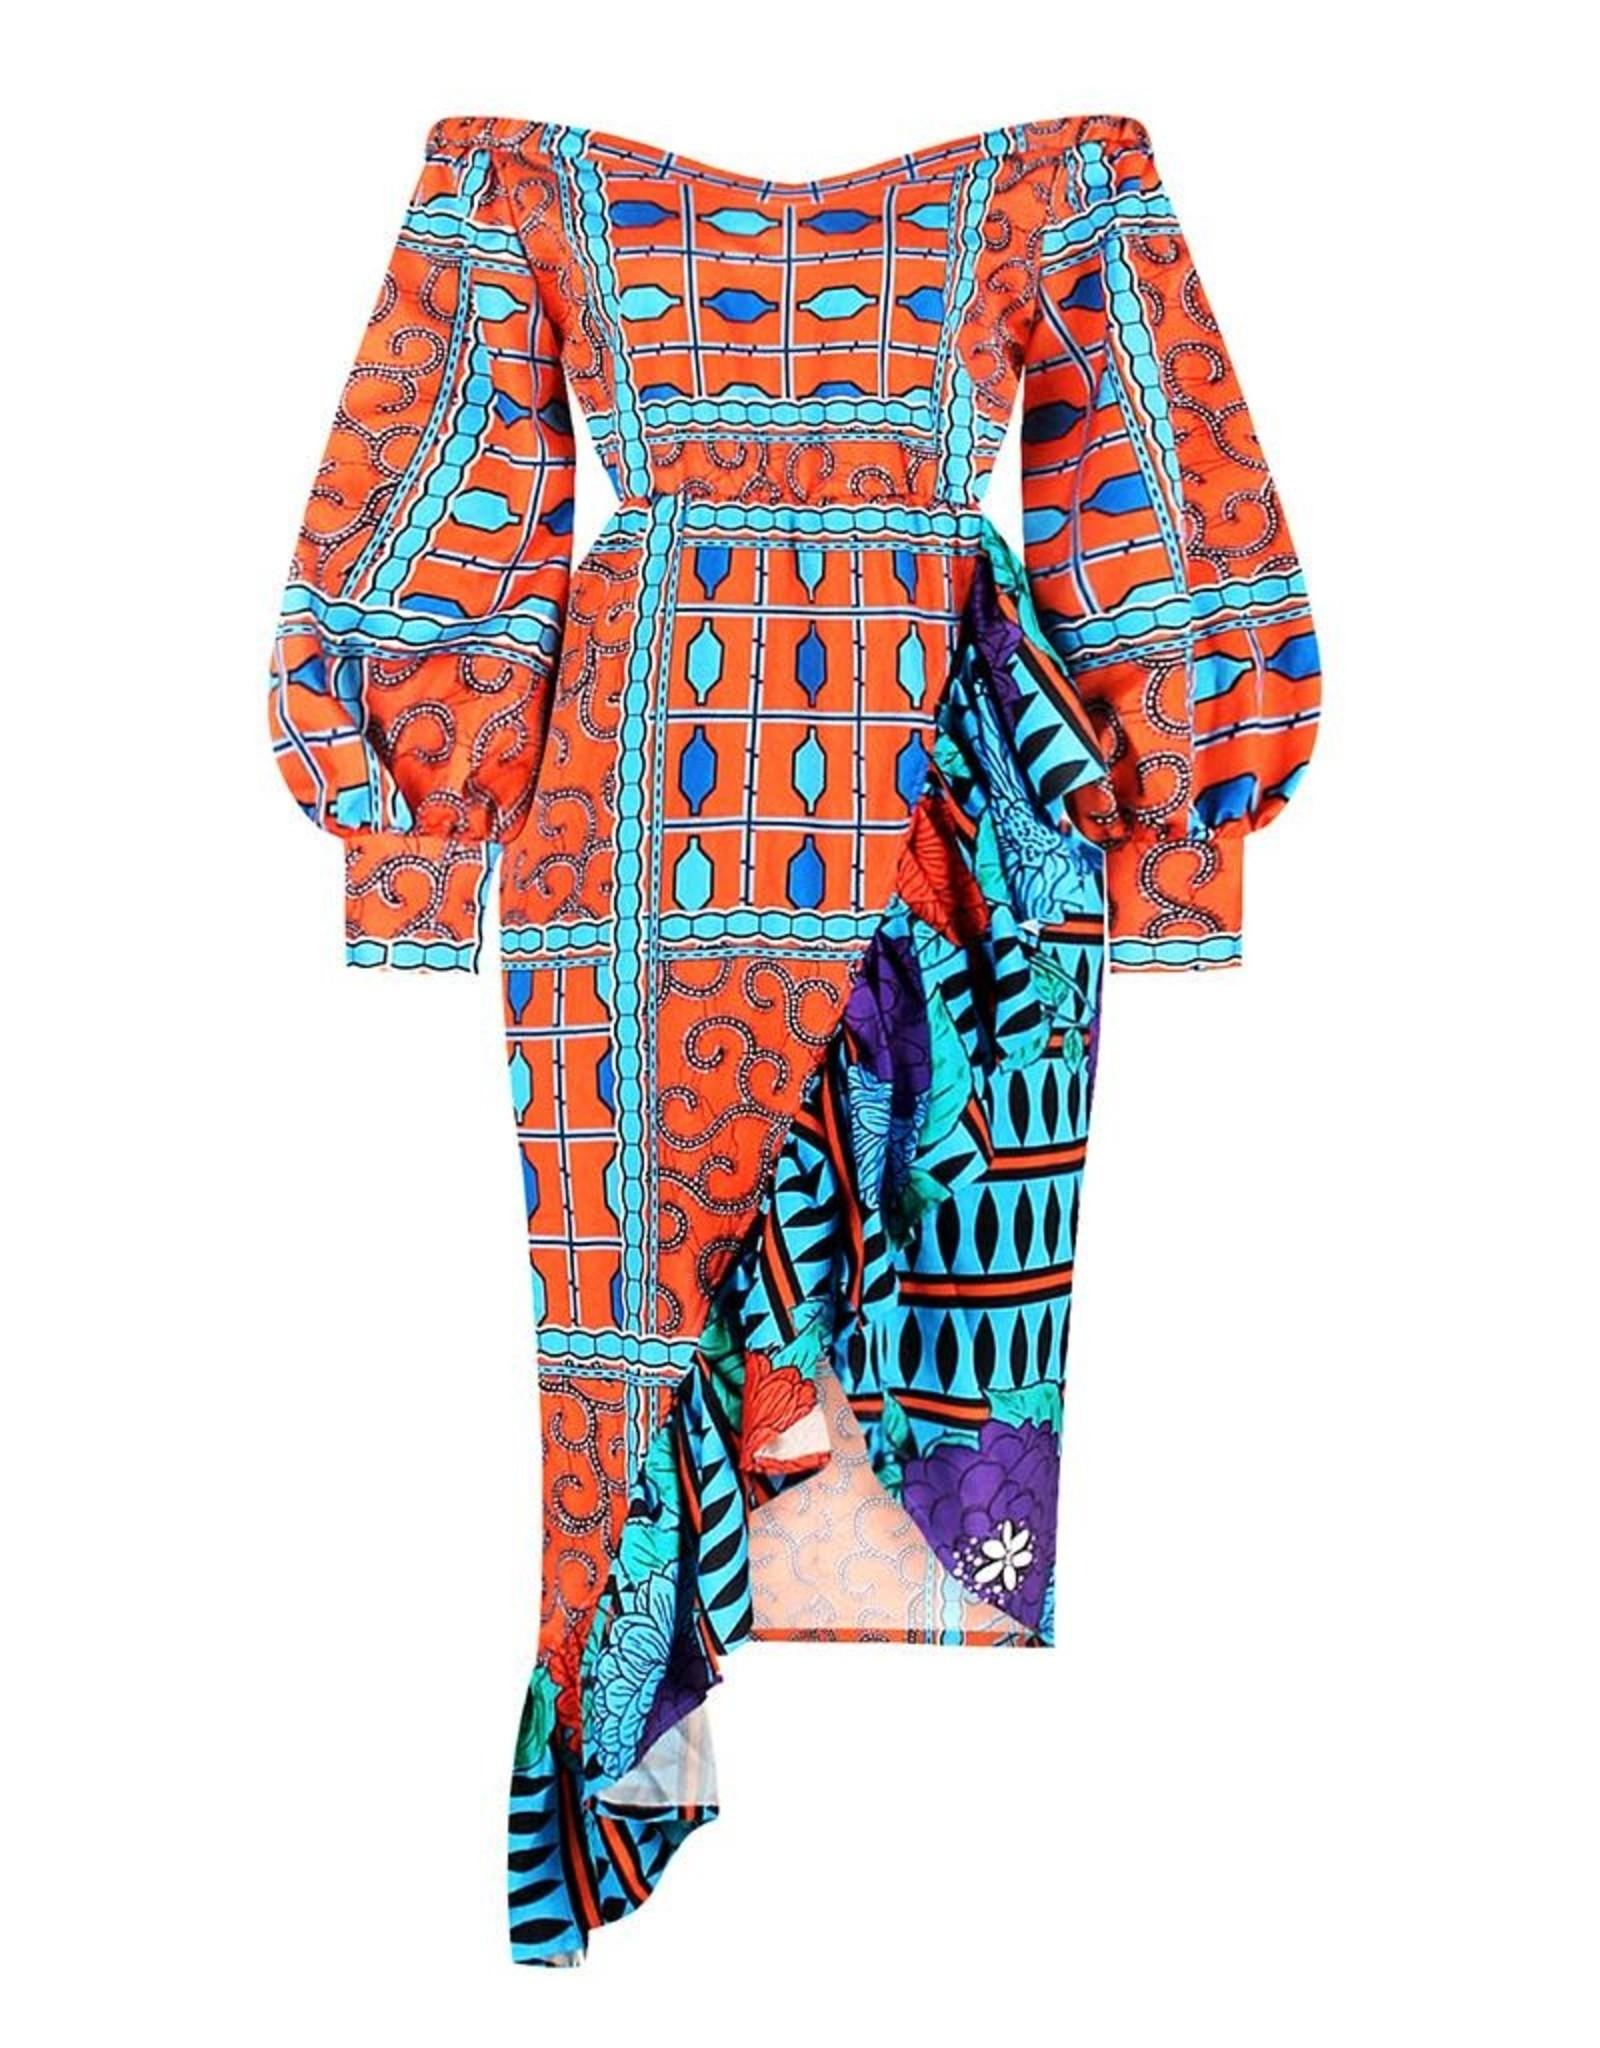 Asymmetrical Off the Shoulder Ruffled Hem Dress